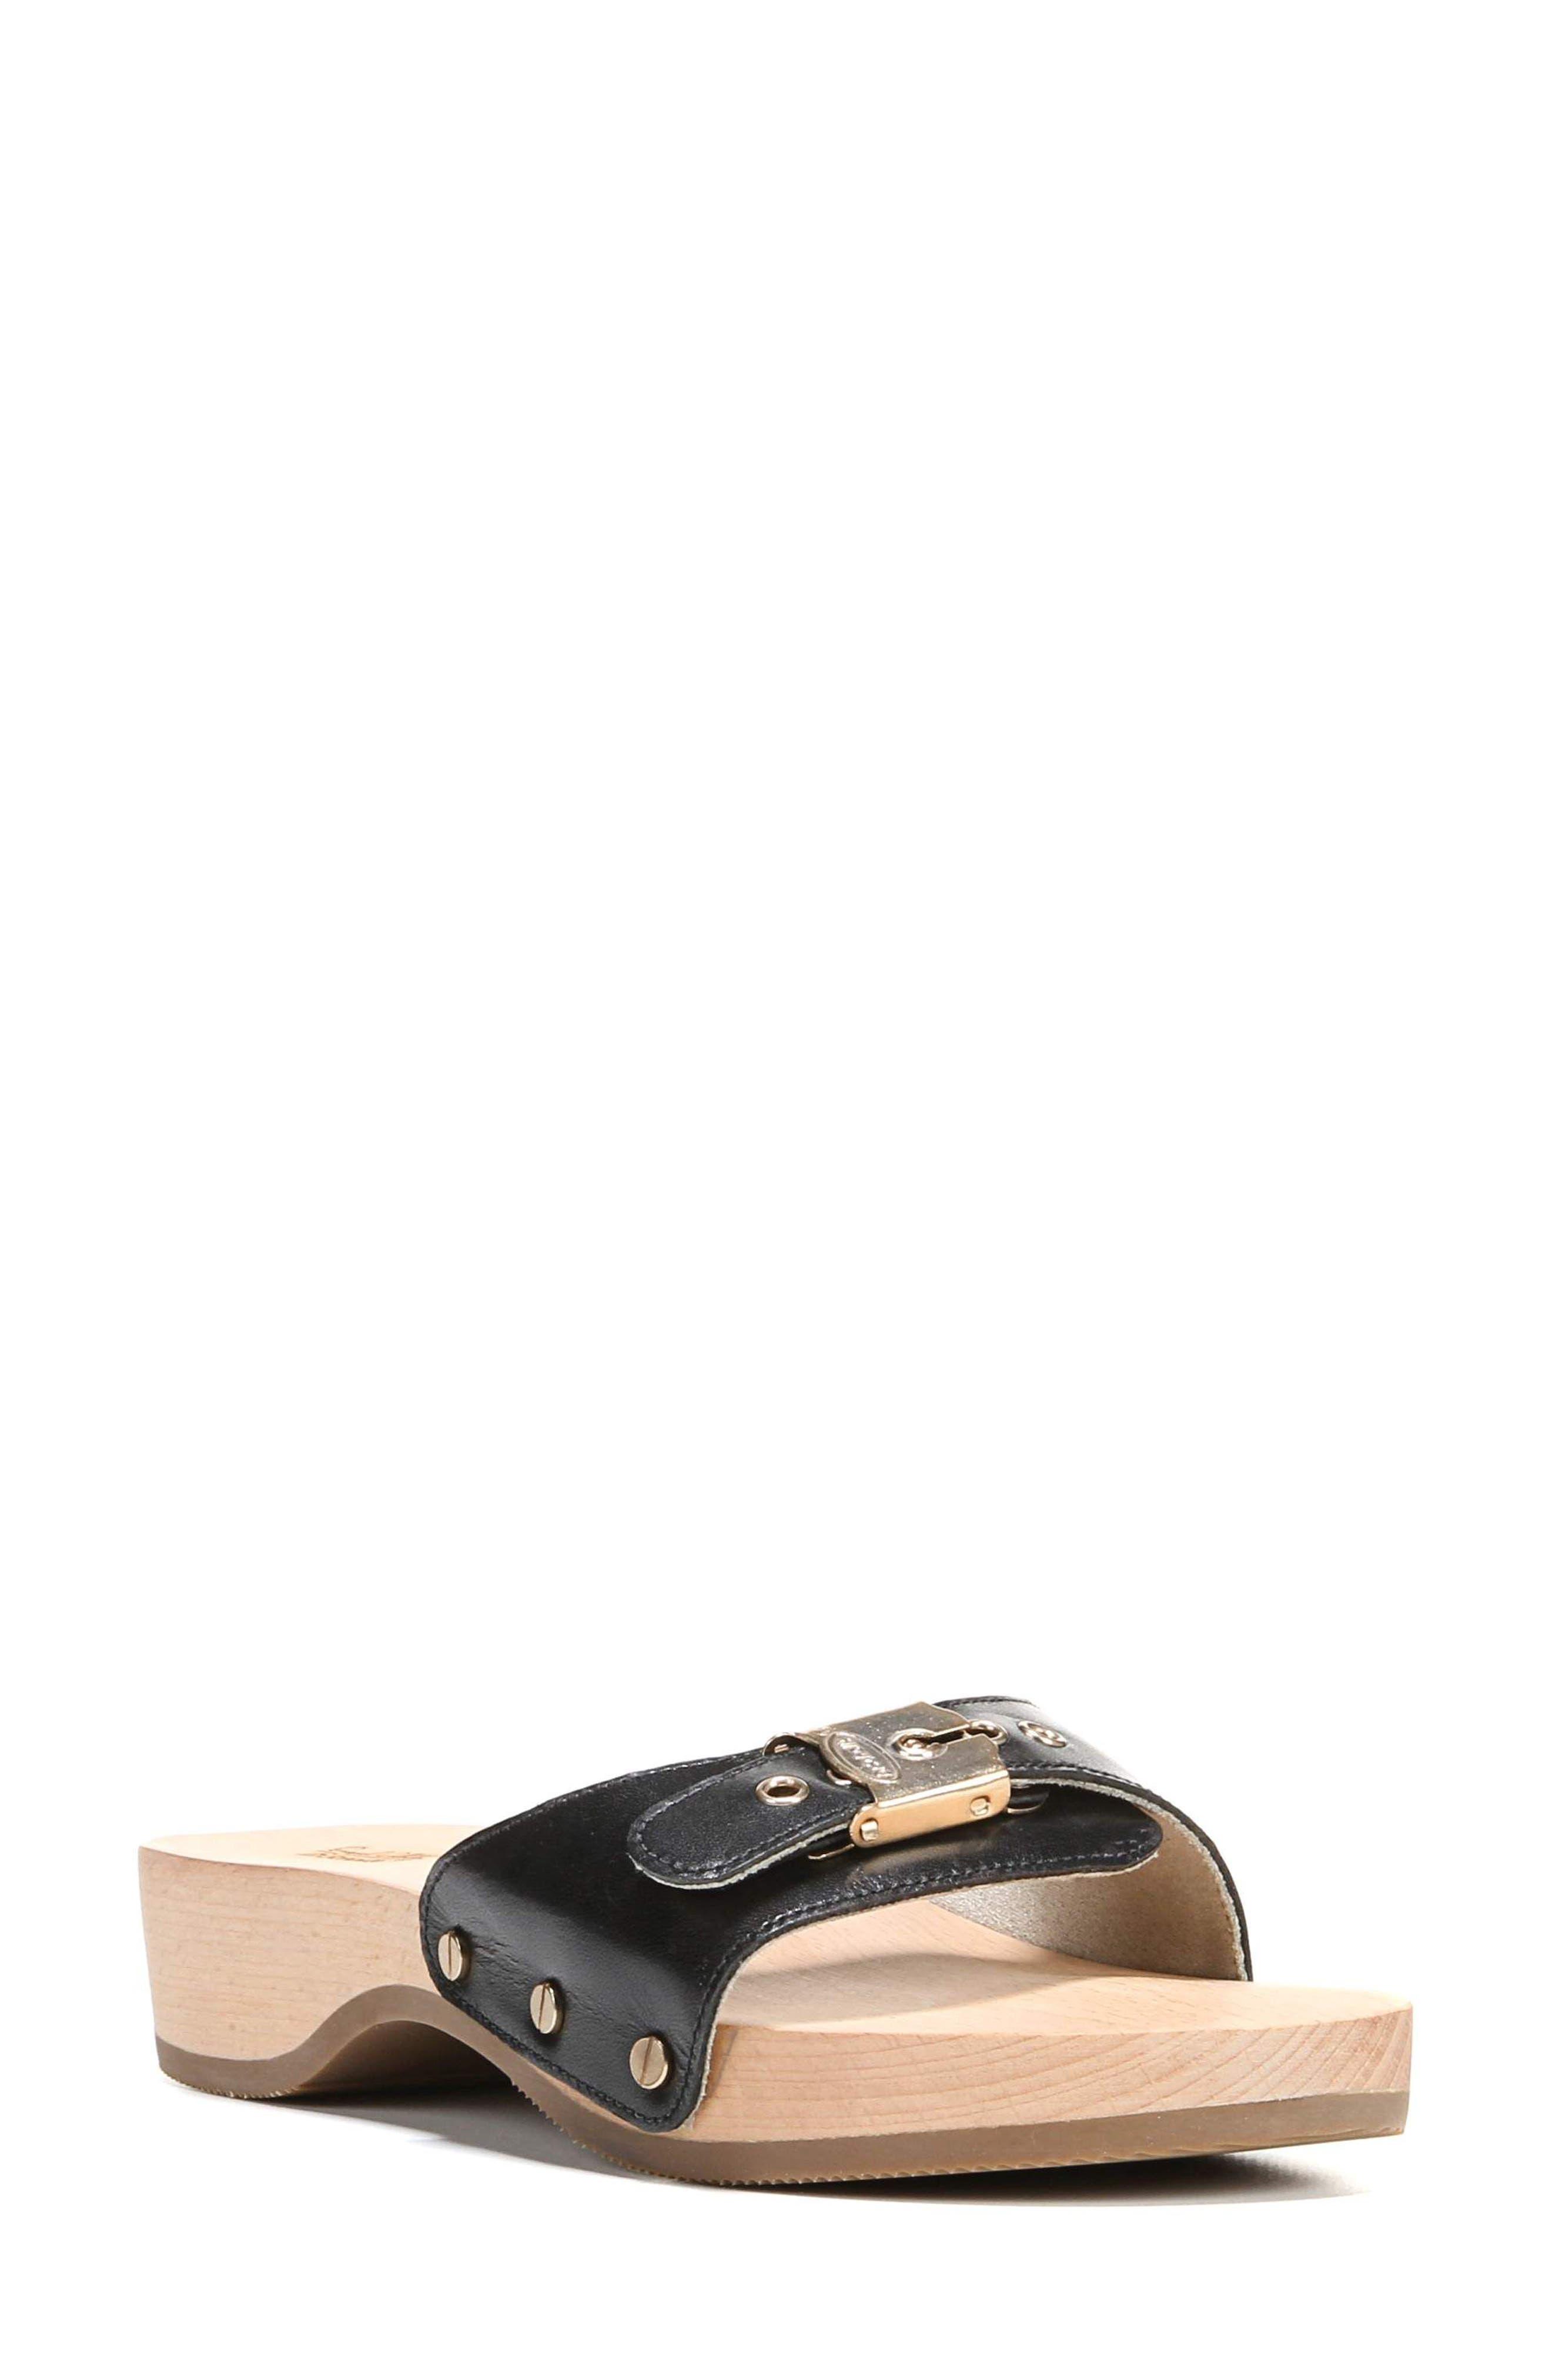 Original Collection Sandal,                             Alternate thumbnail 2, color,                             BLACK